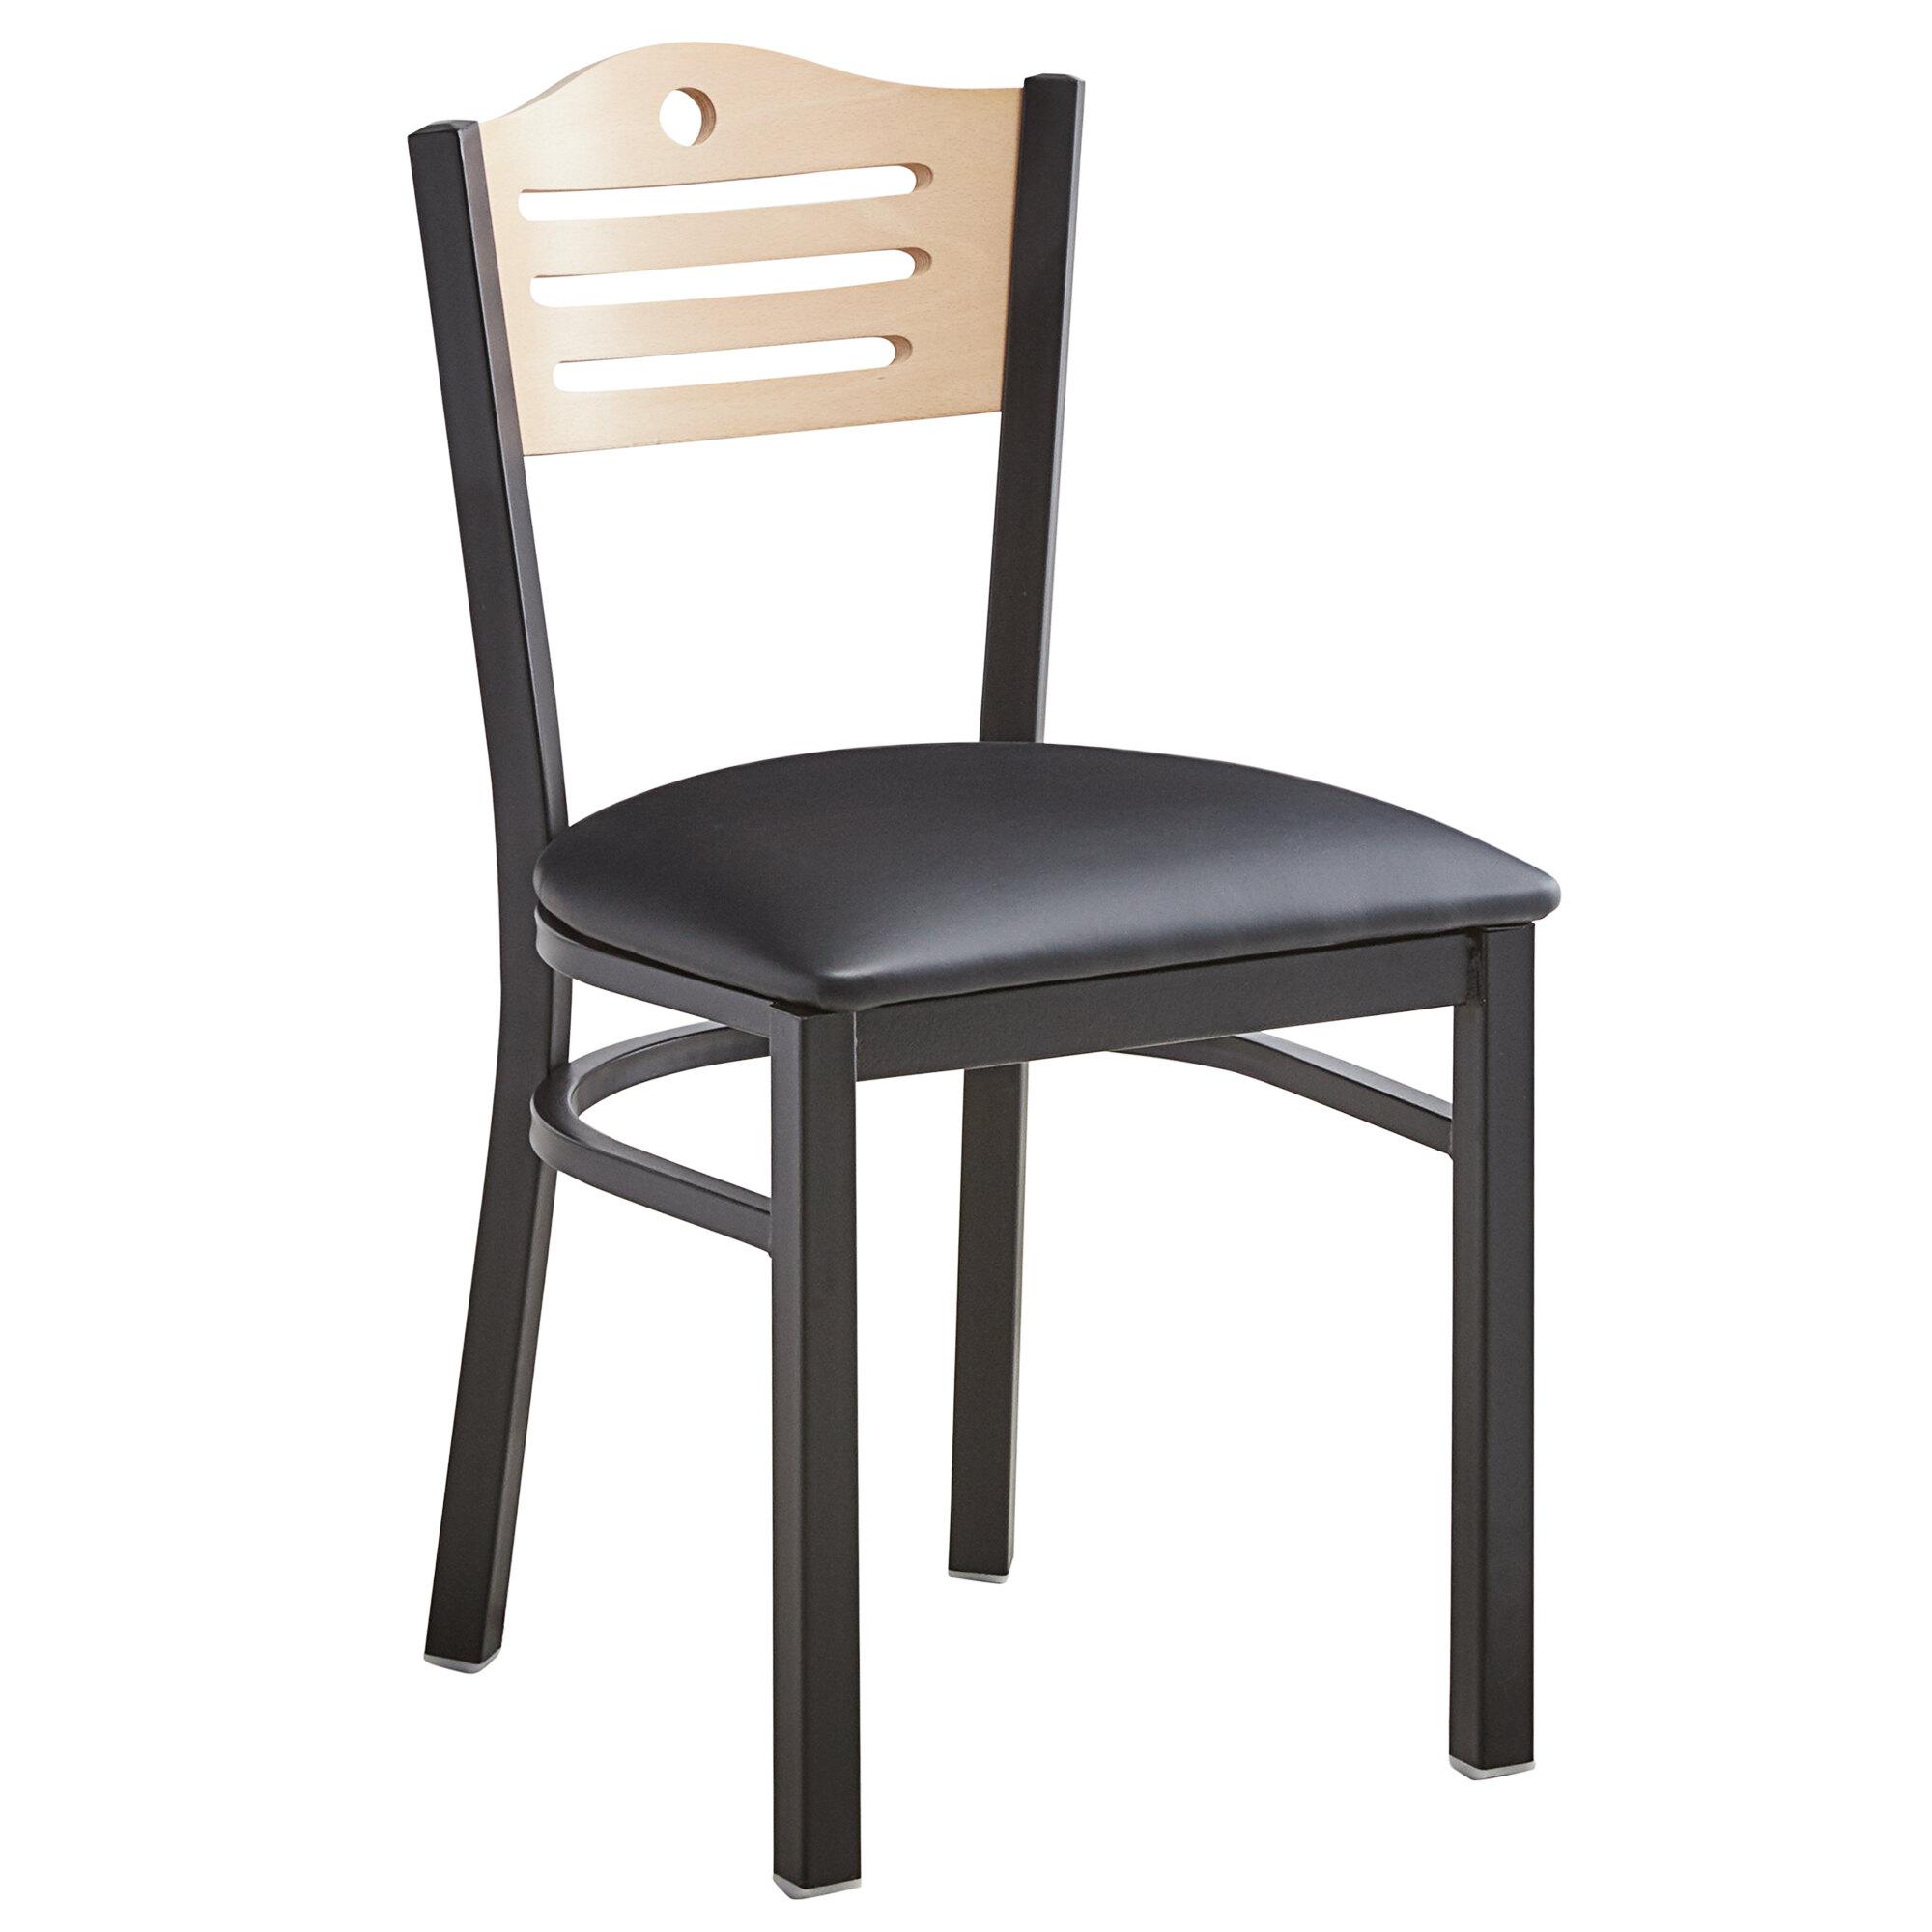 #171 - Slat Back Design Restaurant Metal Chair with Natural Wood Back and Black Vinyl Seat